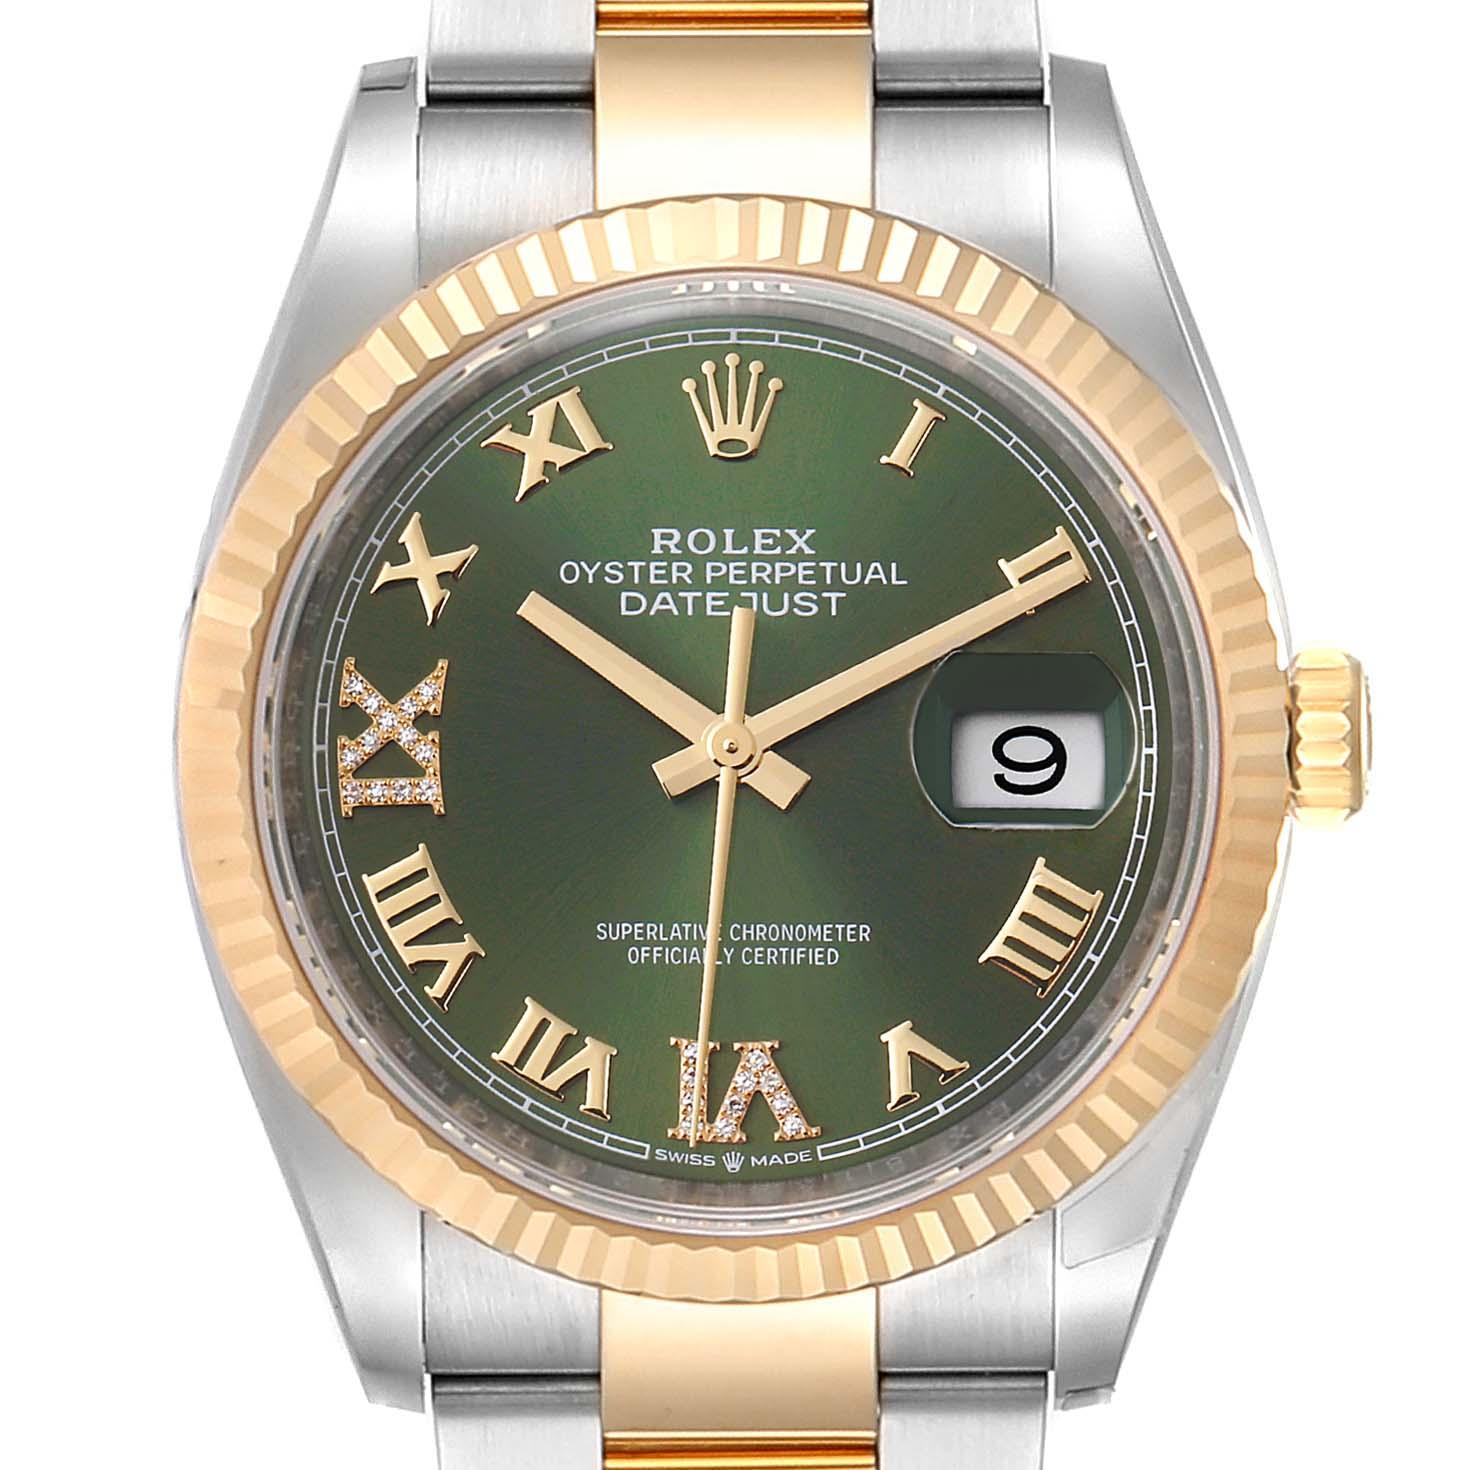 Rolex Datejust Steel Yellow Gold Green Diamond Dial Watch 126233 Unworn